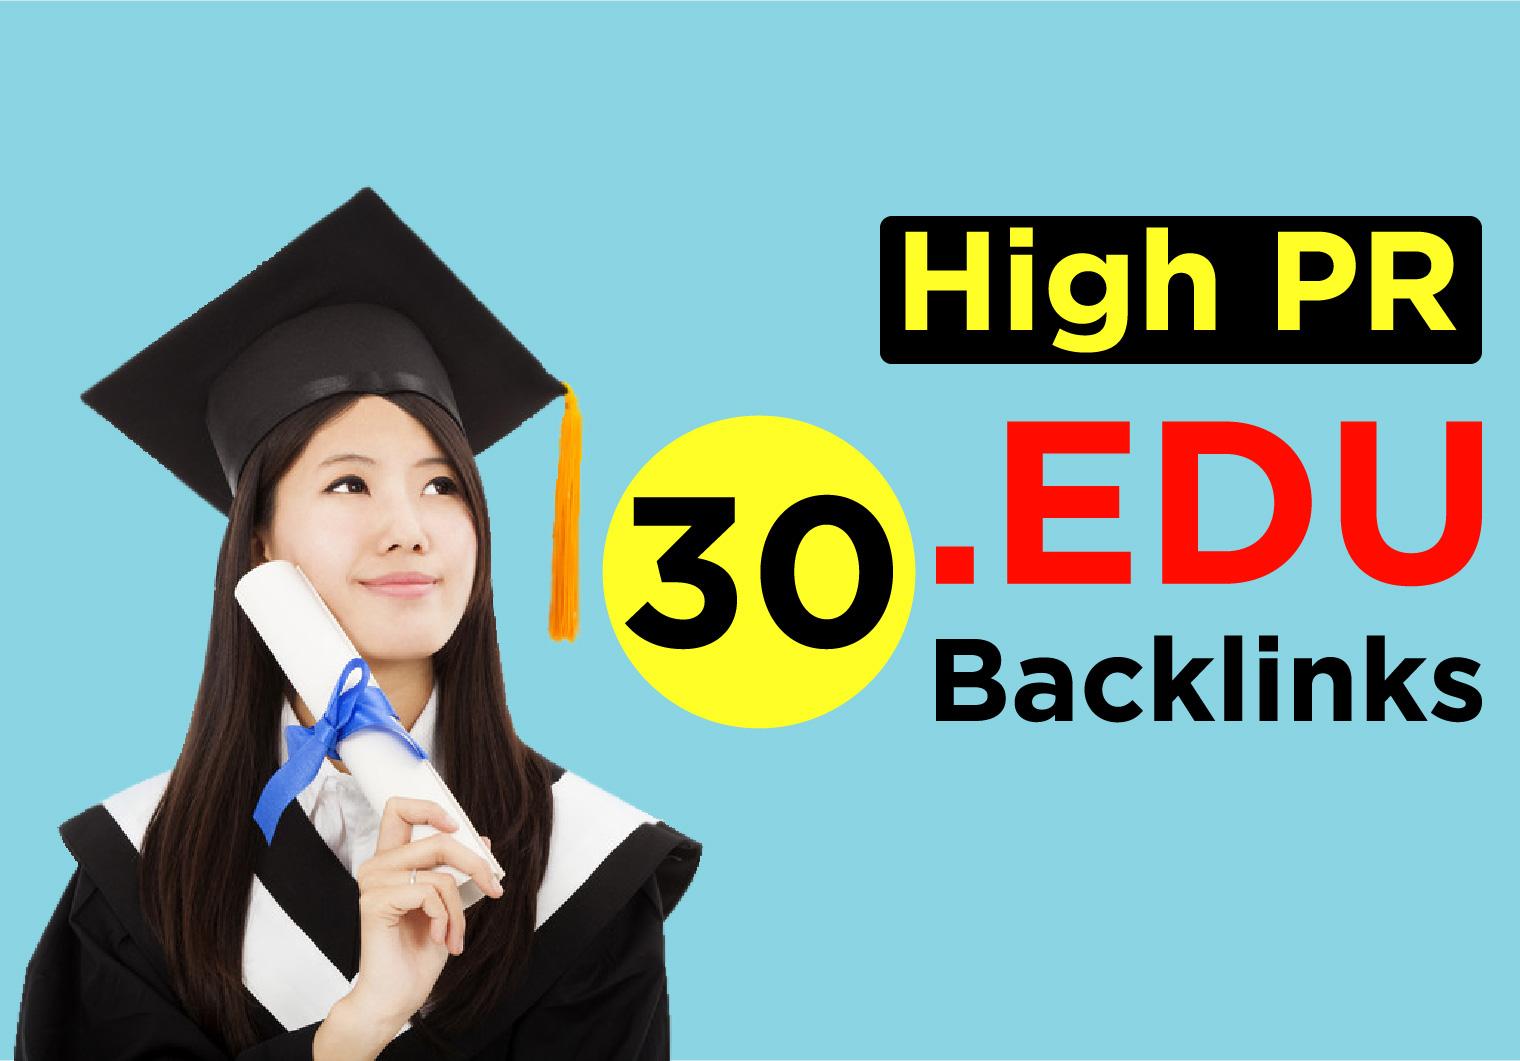 USA Based 30 Edu Backlinks High PR Safe SEO Backlinks - Boost Your Google Ranking